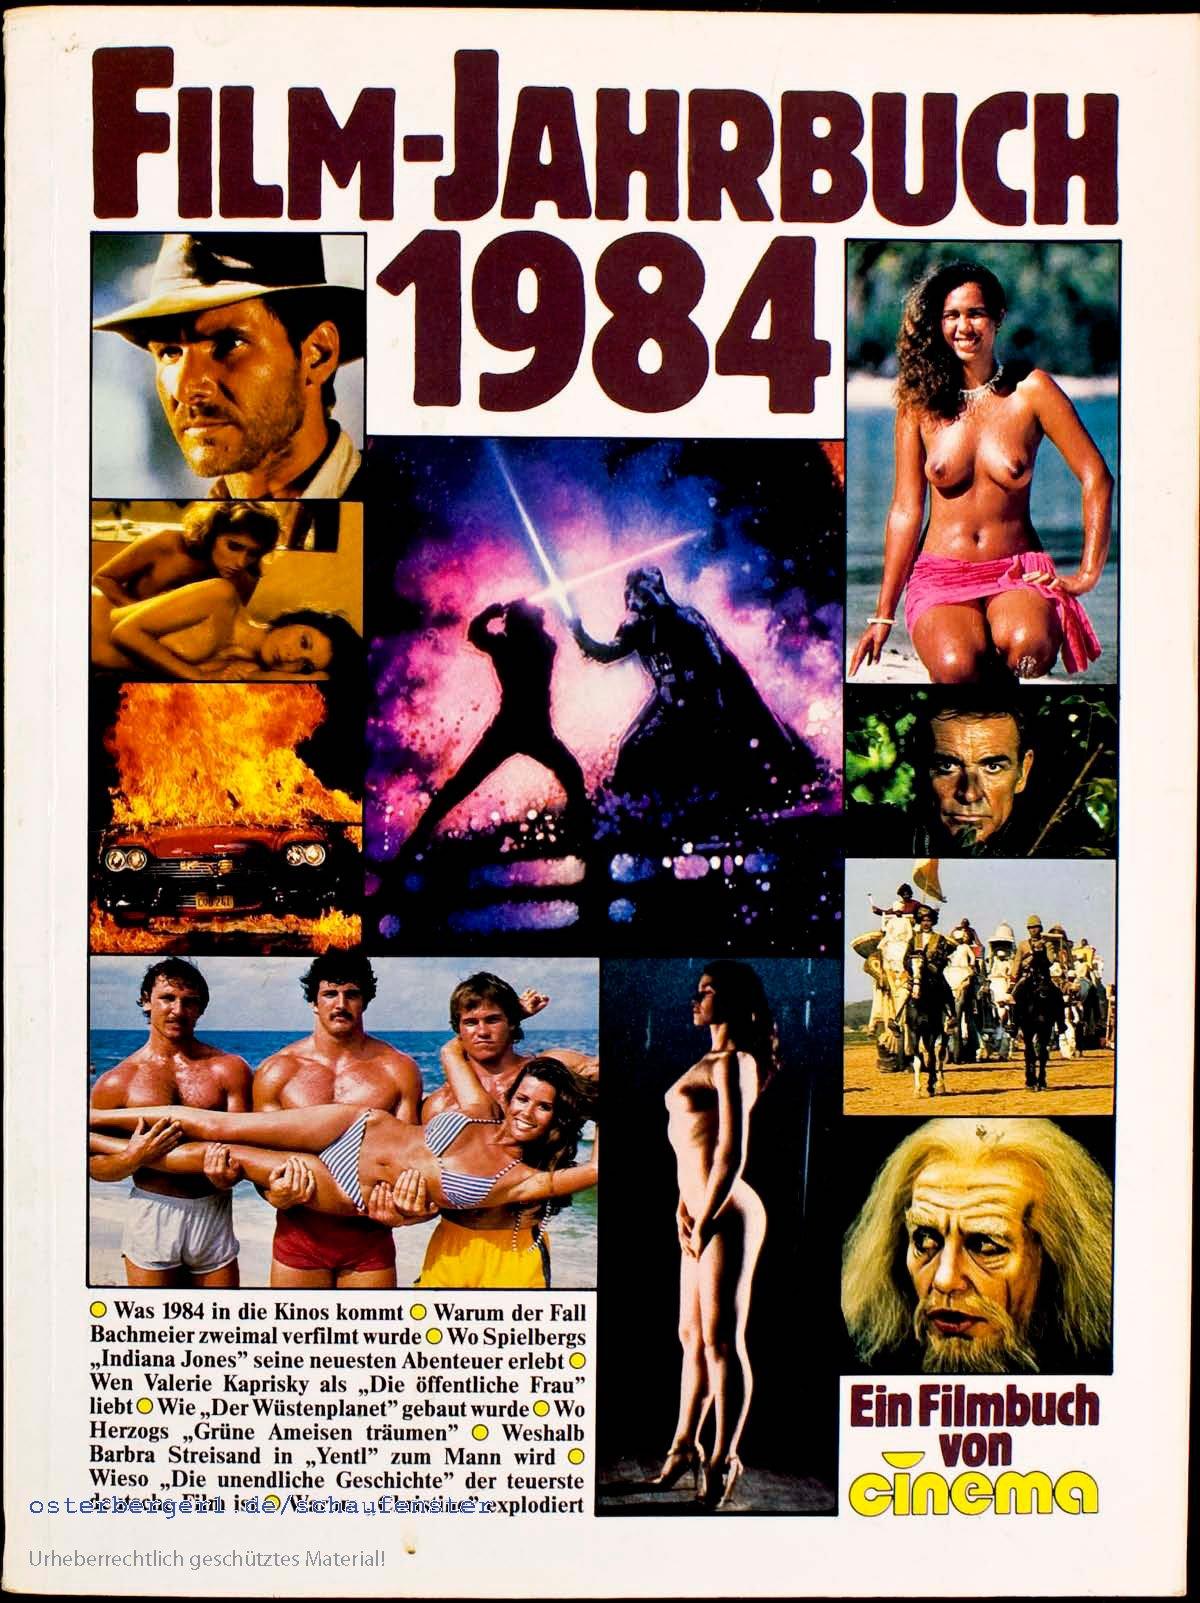 Film-Jahrbuch 1984